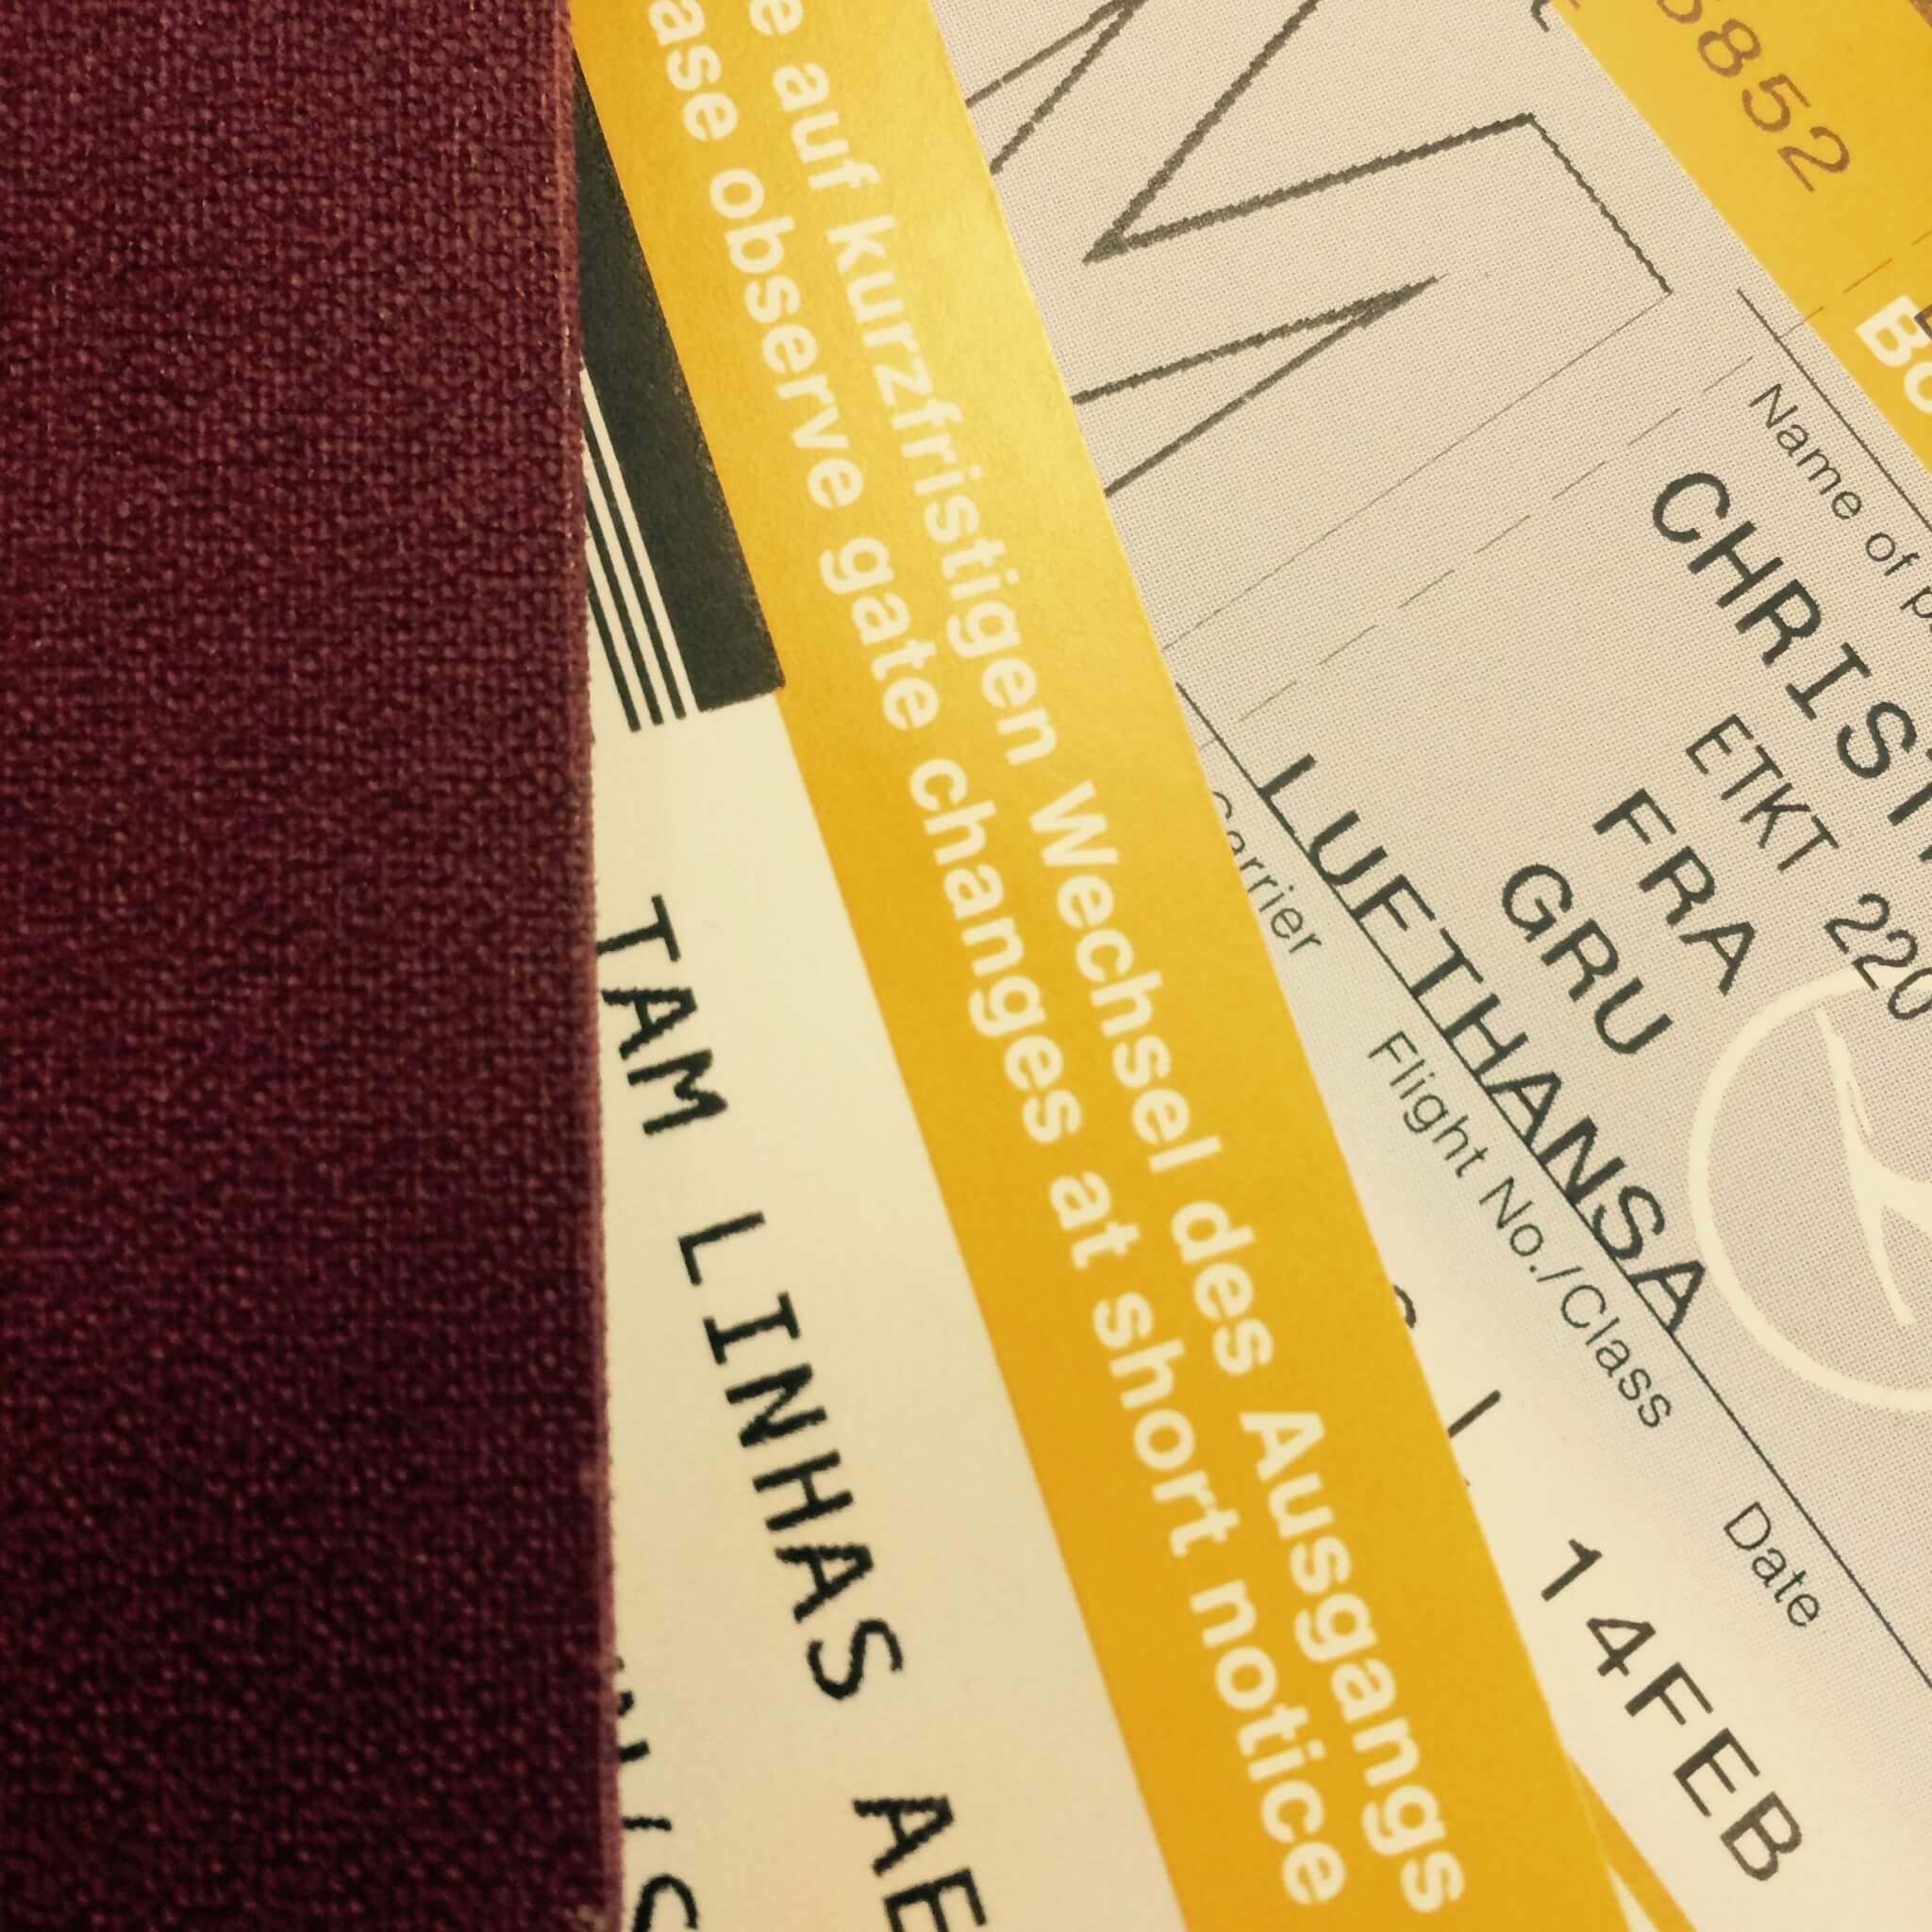 Flight tickets, TAM Linhas Aereas